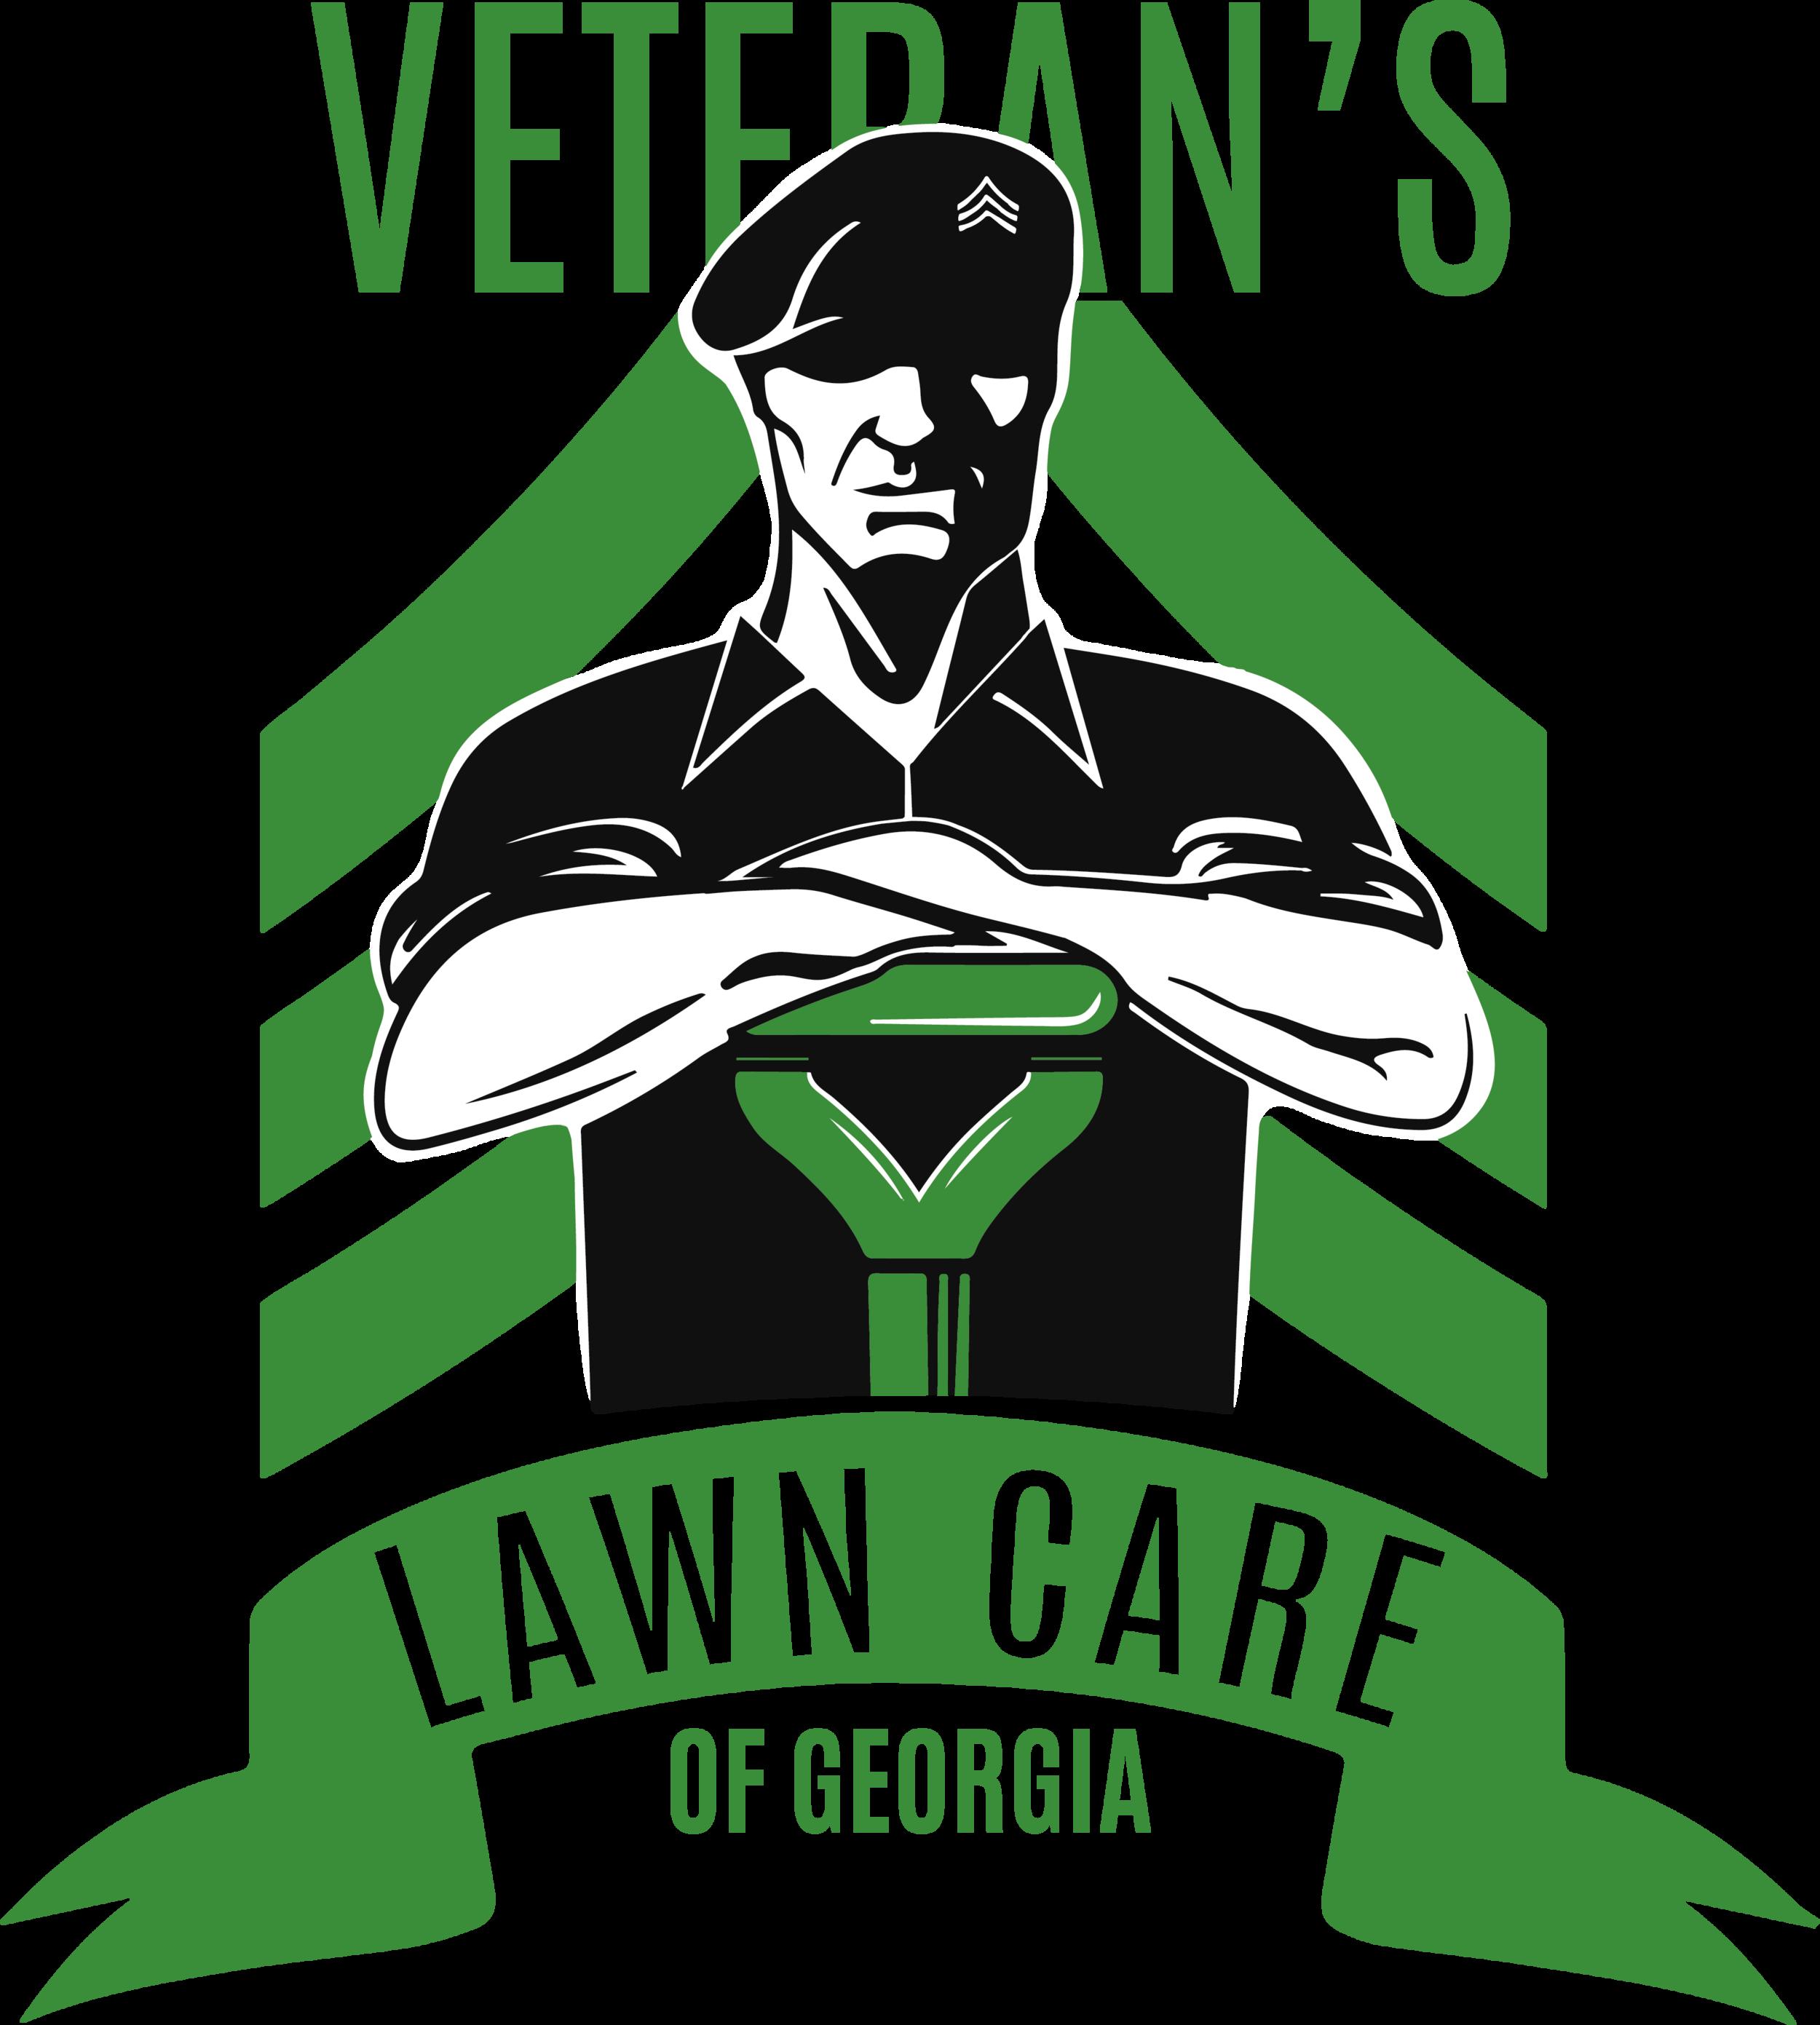 Veteran's Lawn Care of Georgia